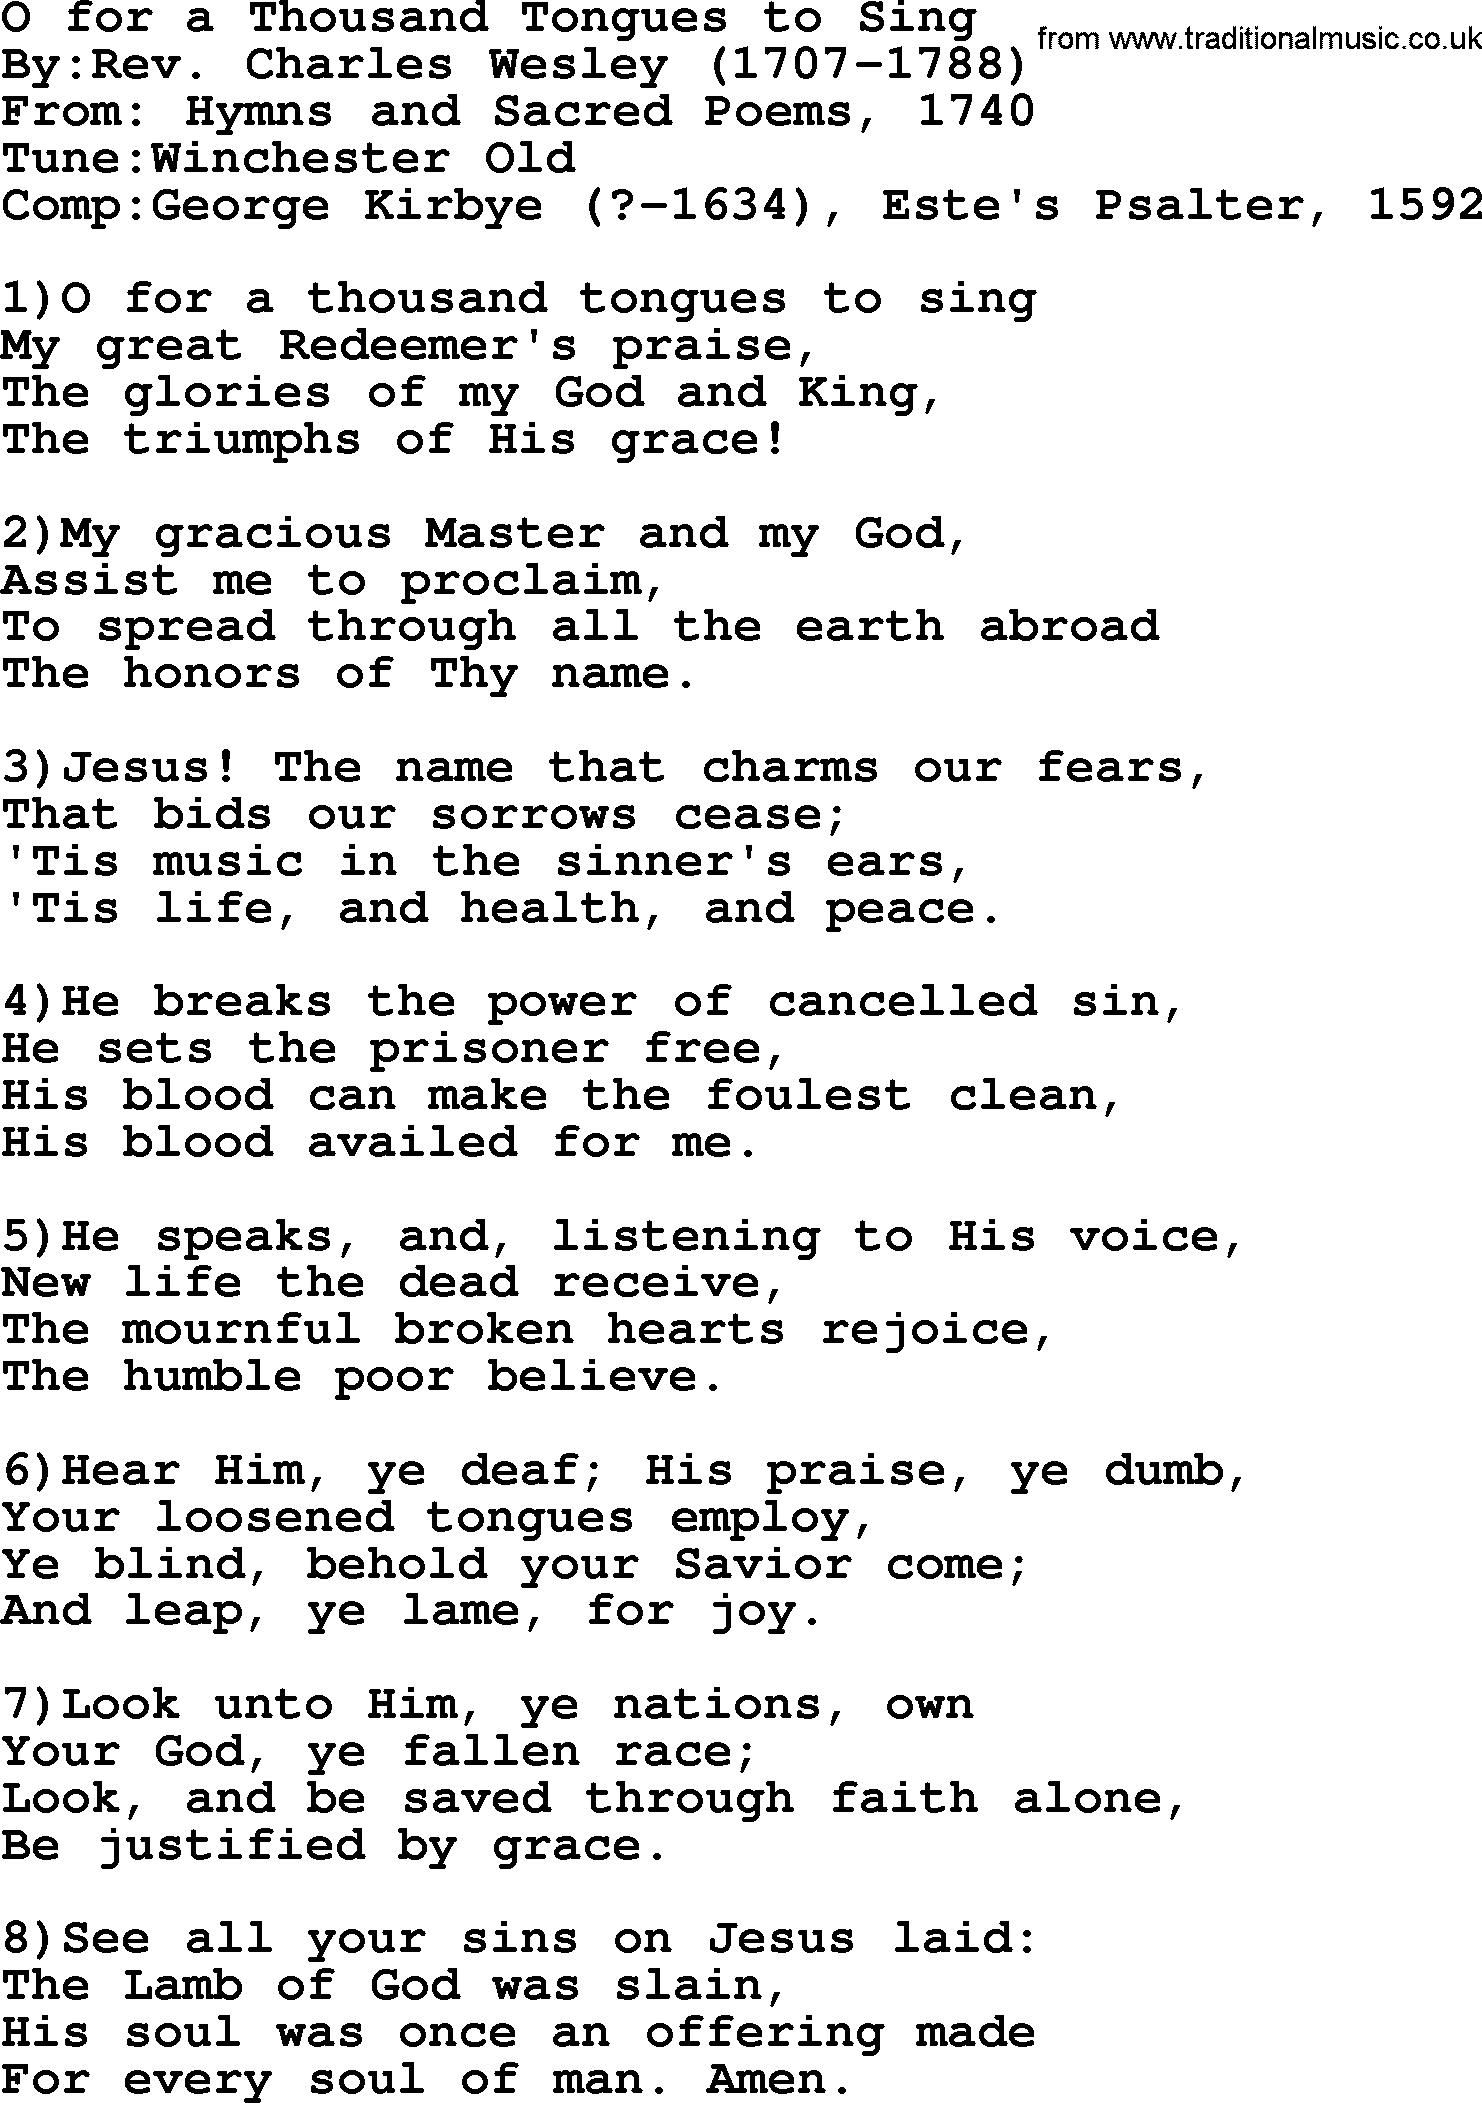 Earth Clean Lyrics : earth, clean, lyrics, Lyrics, Center:, Earth, Clean, Version